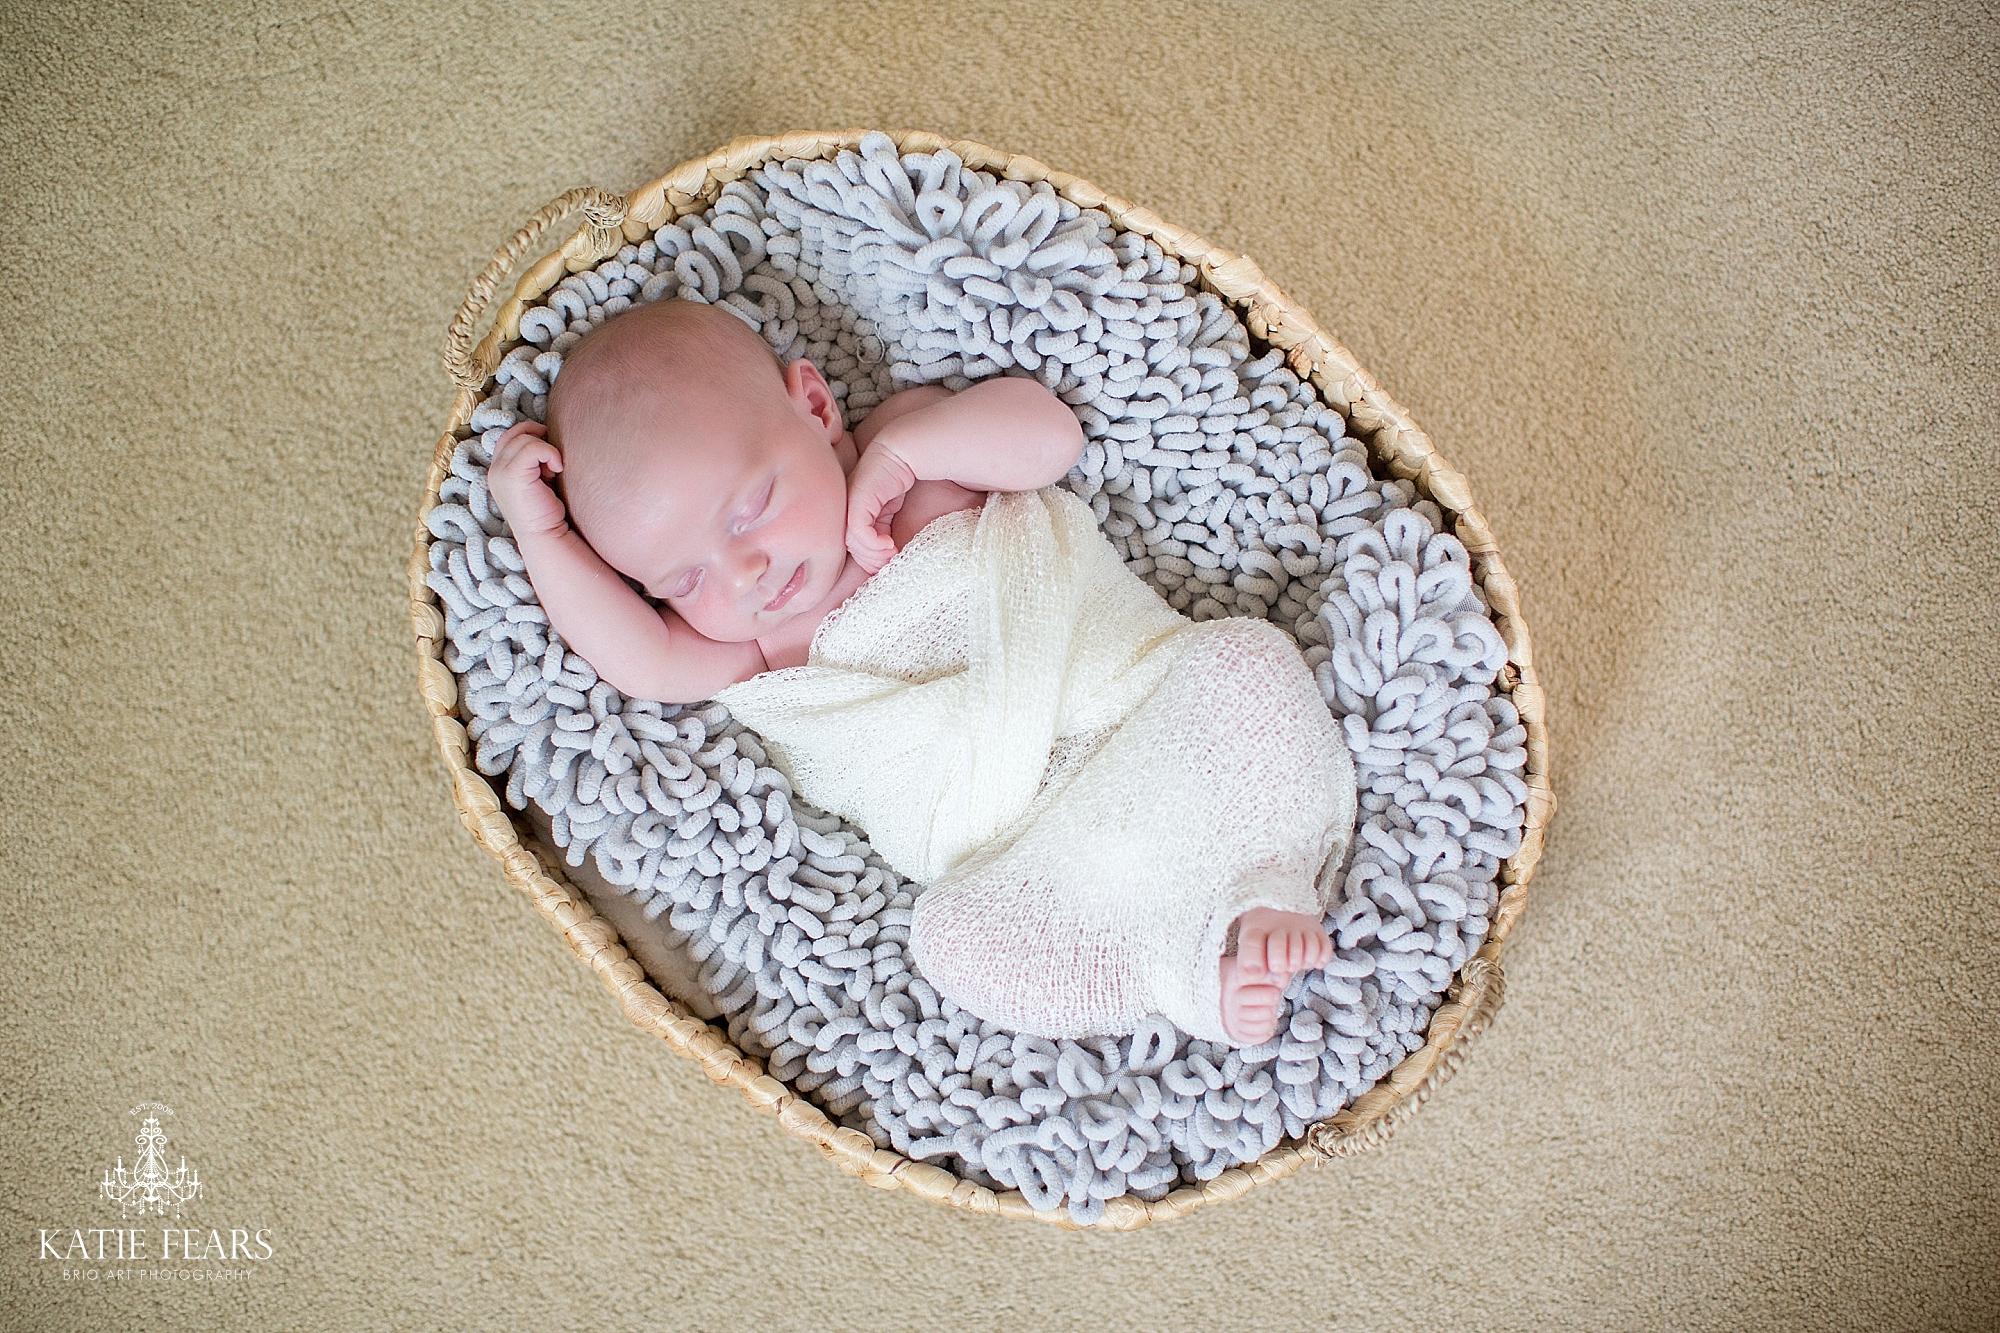 BrioArt-Thomas-Newborn-028_WEB.jpg